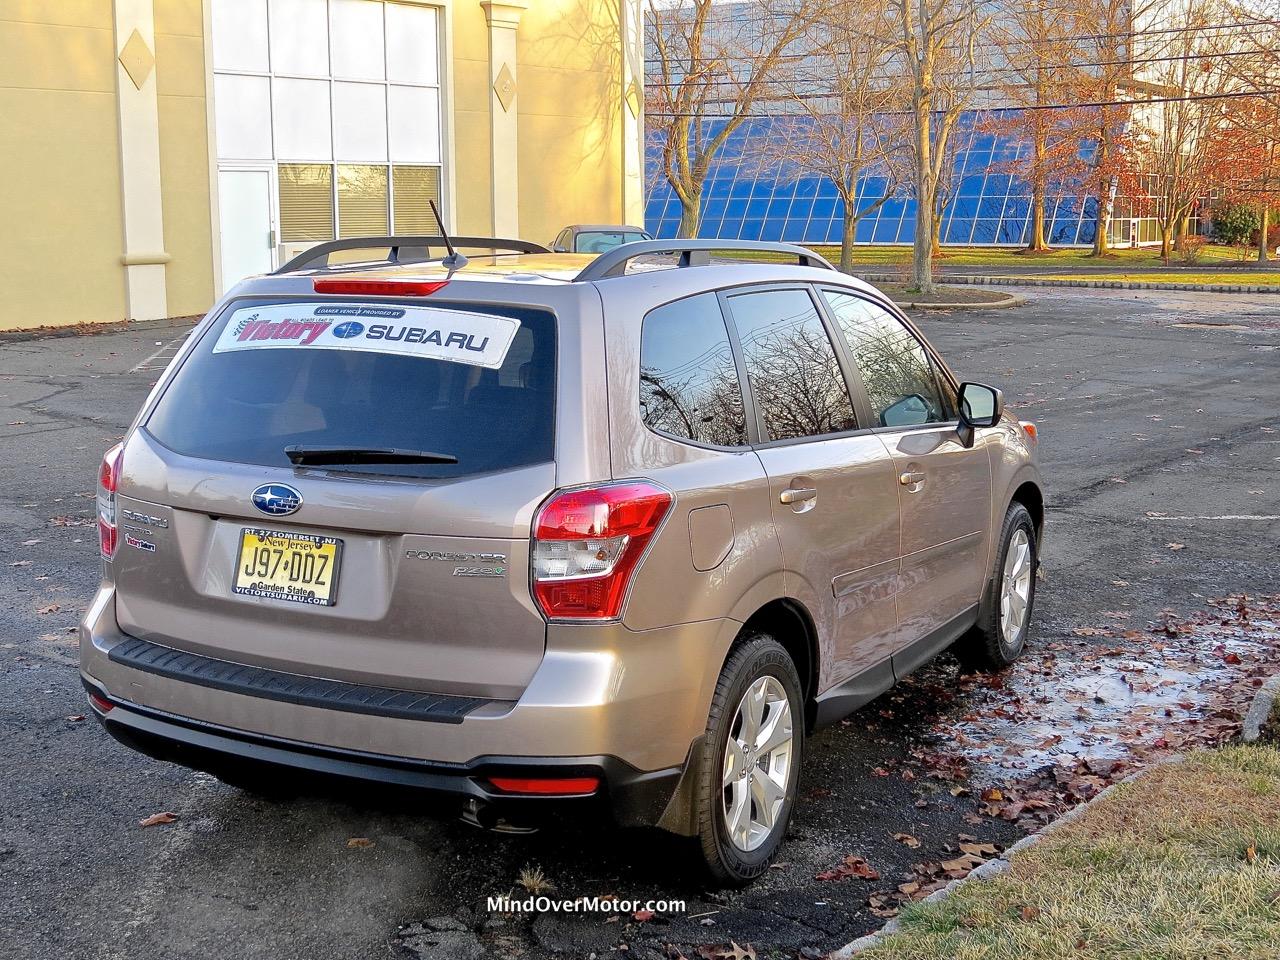 2015 Subaru Forester Rear Angle